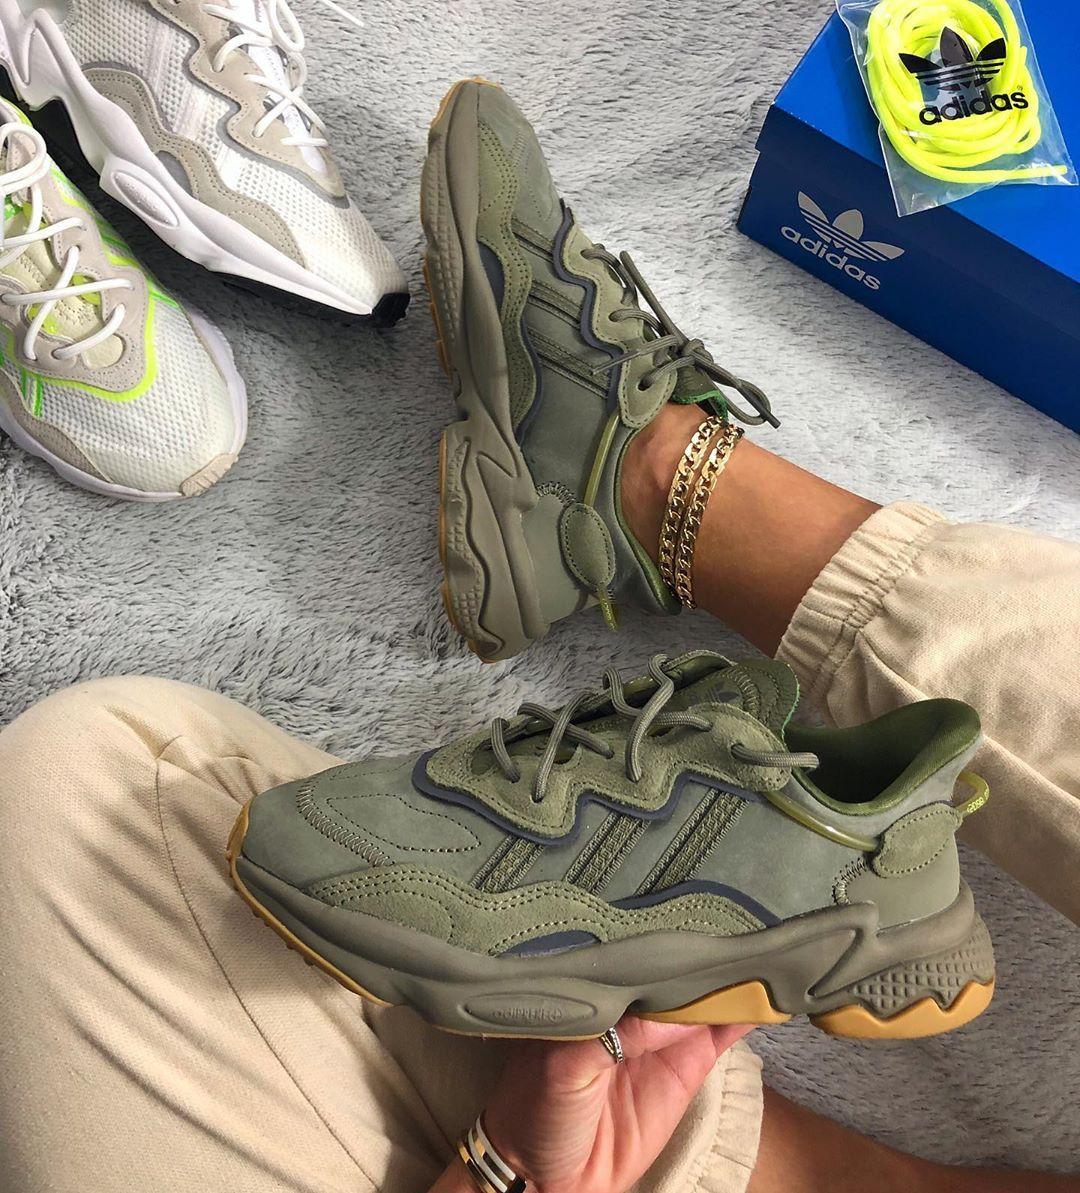 Adidas Originals Ozweego In 2020 Nike Air Schuhe Sneakers Mode Adidas Originals Sneaker